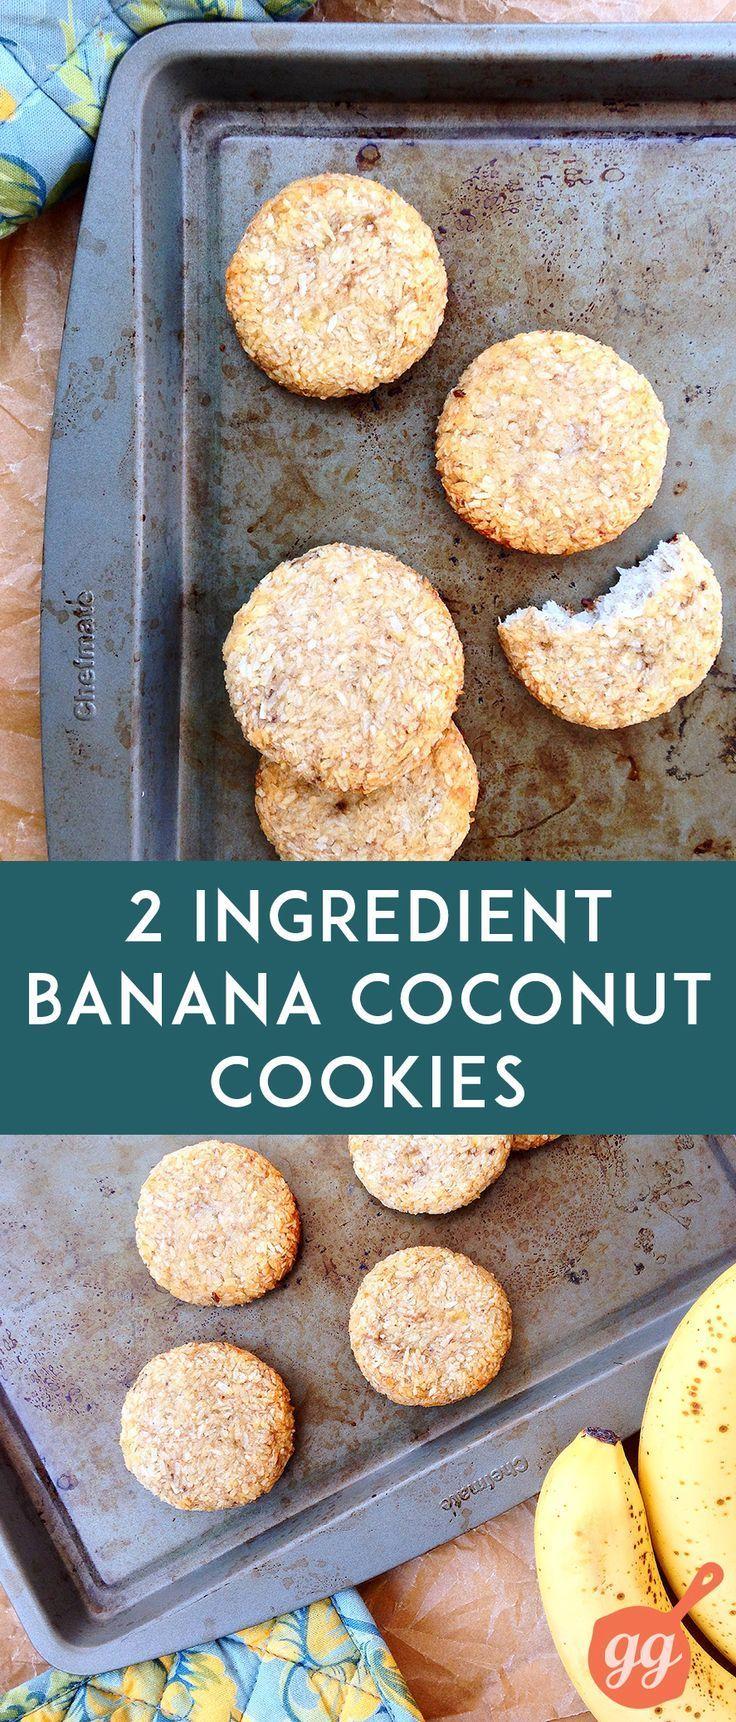 The name says it all! 2 Ingredient Banana Coconut Cookies   #paleo #vegan #healthy